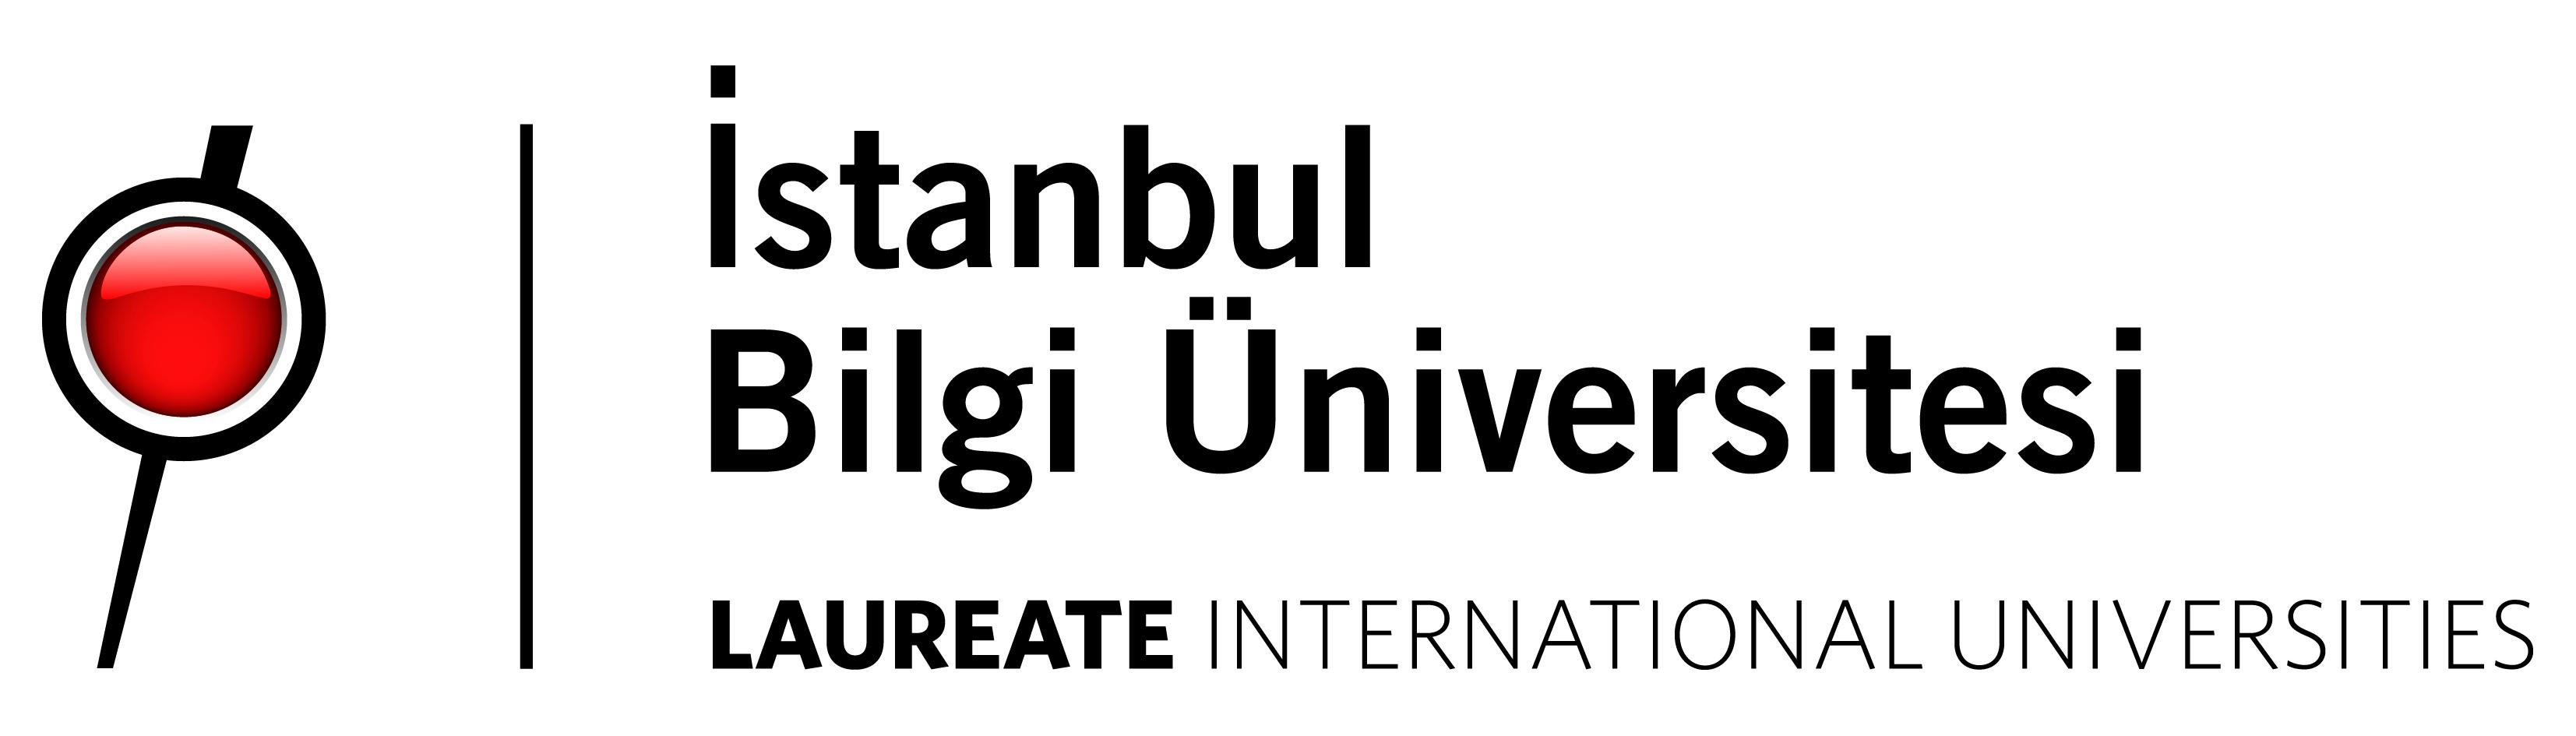 bilgi secilen logo